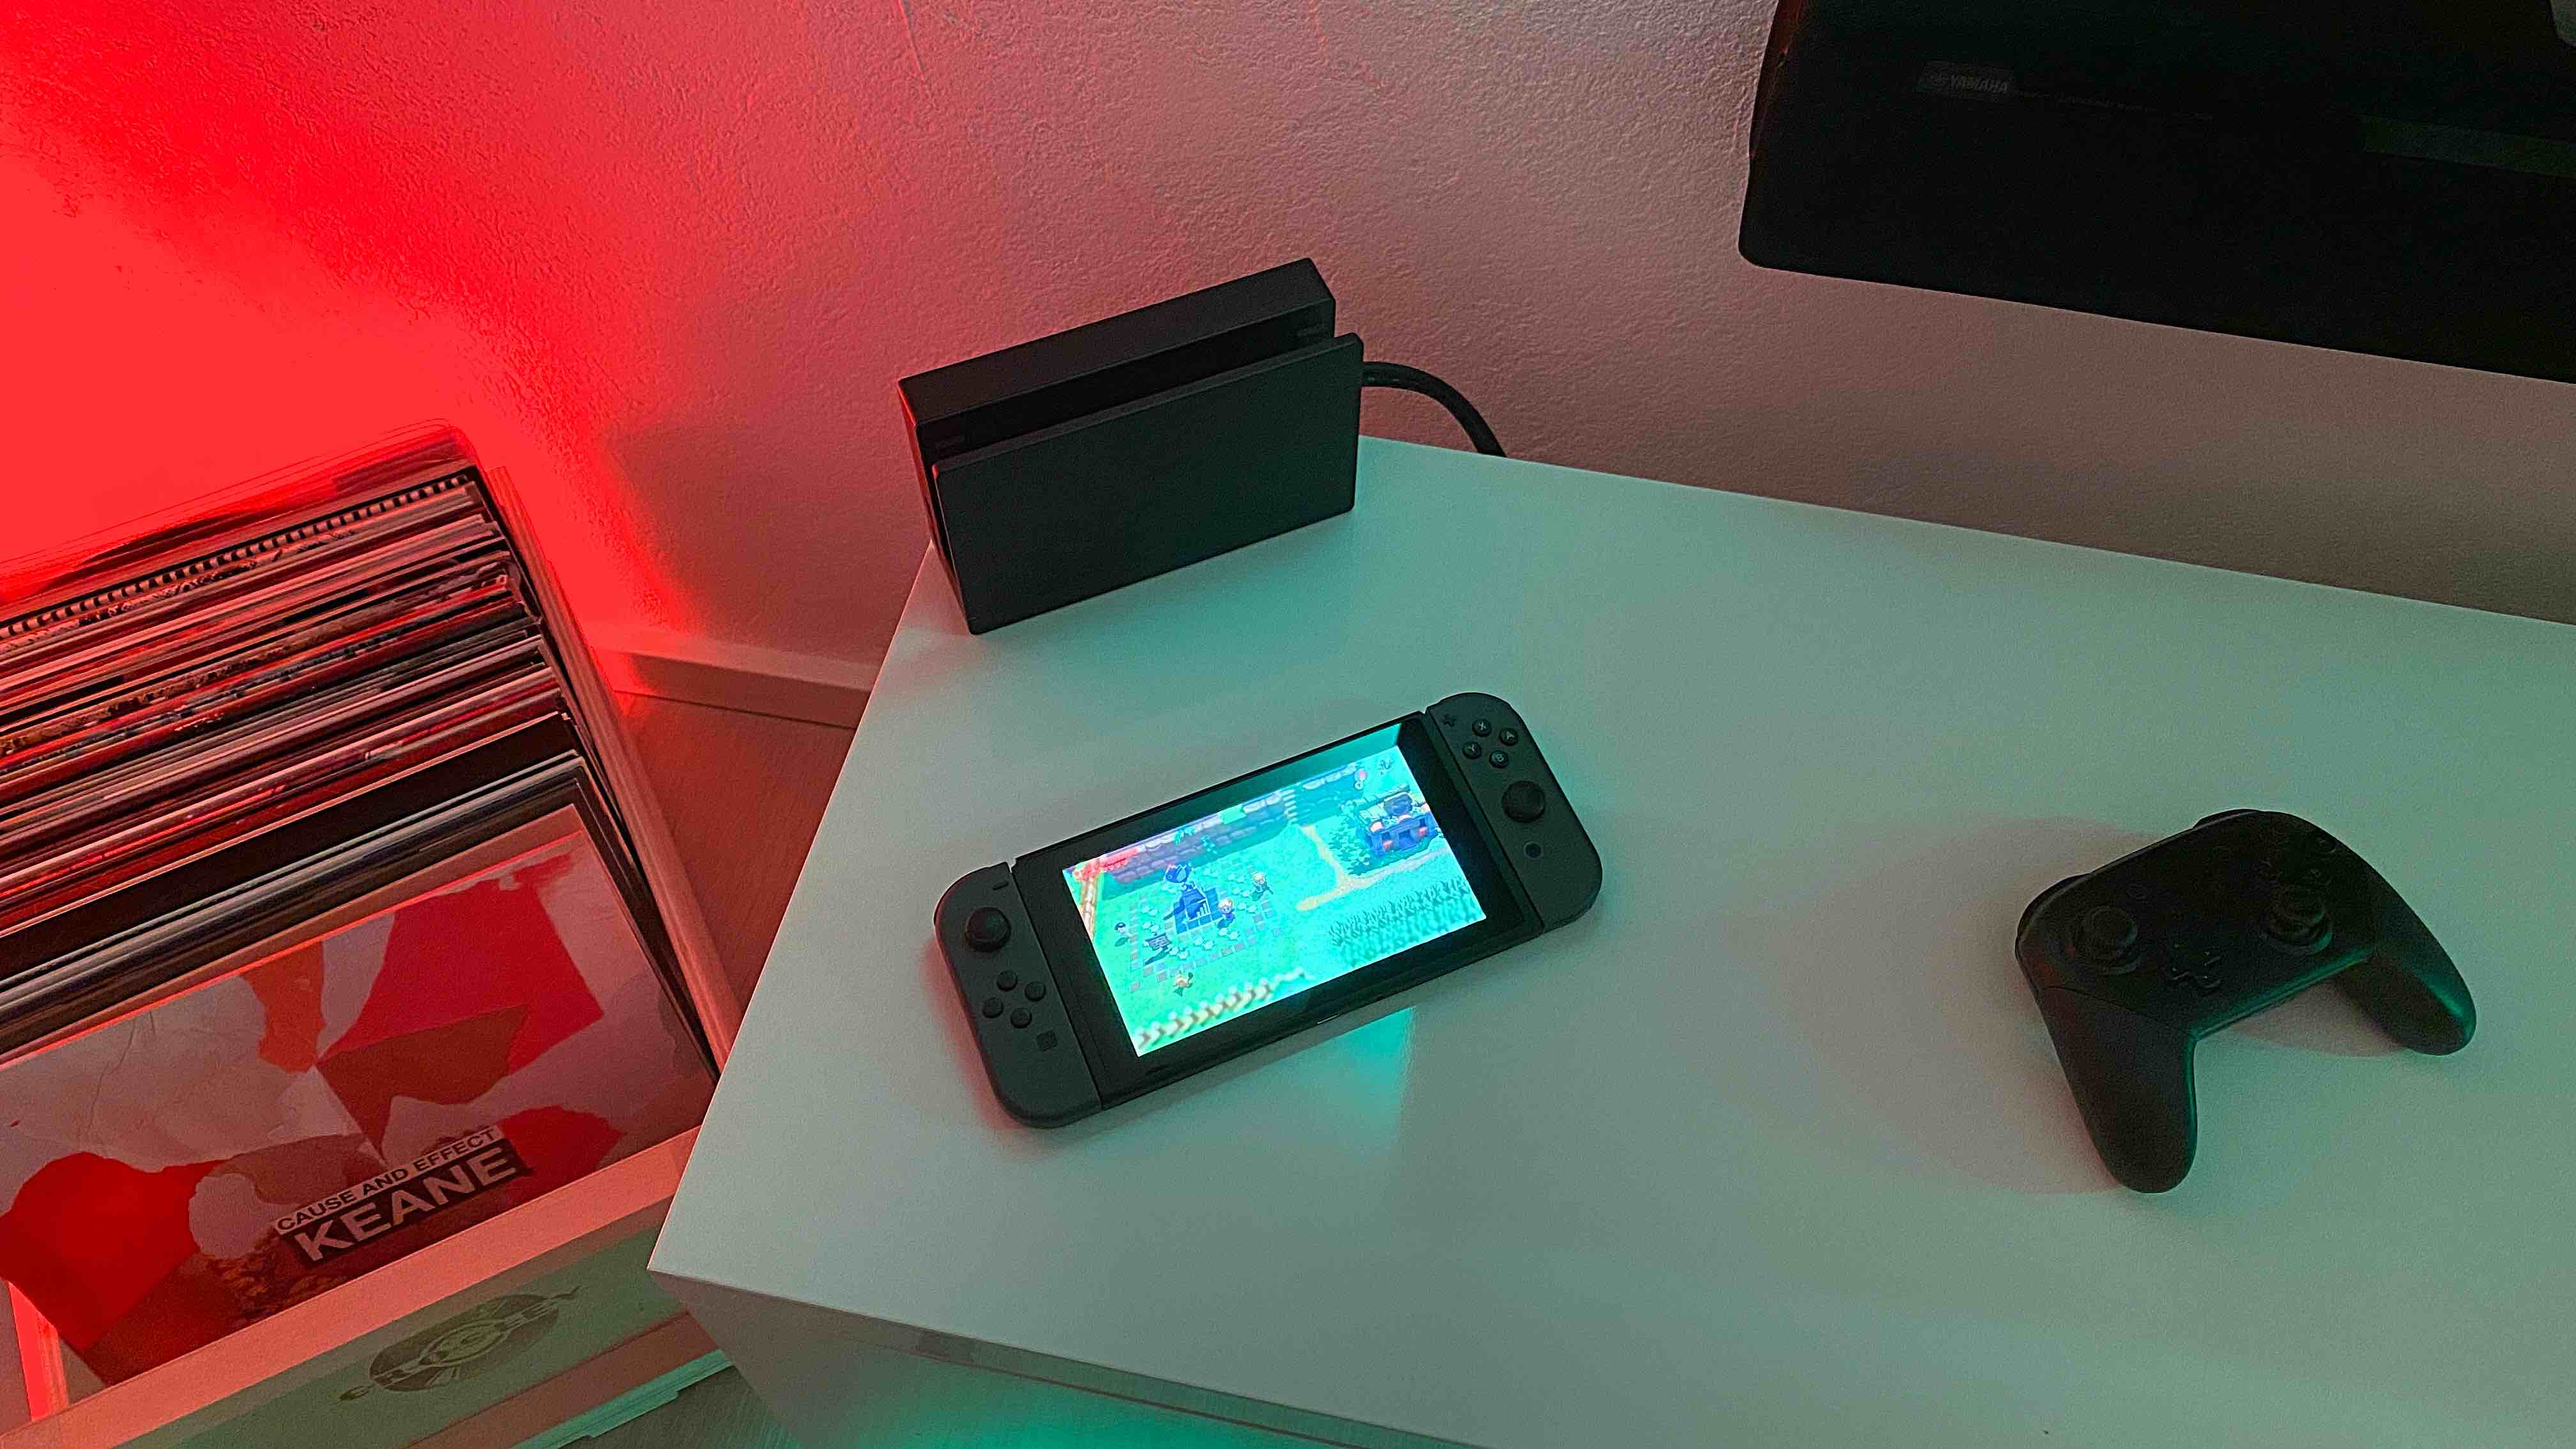 Die_Nintendotaktik_Nintendo_Switch_Rot_Grün_Weiß_Controller_Kolumne_Artikelbild-1 Die Nintendotaktik